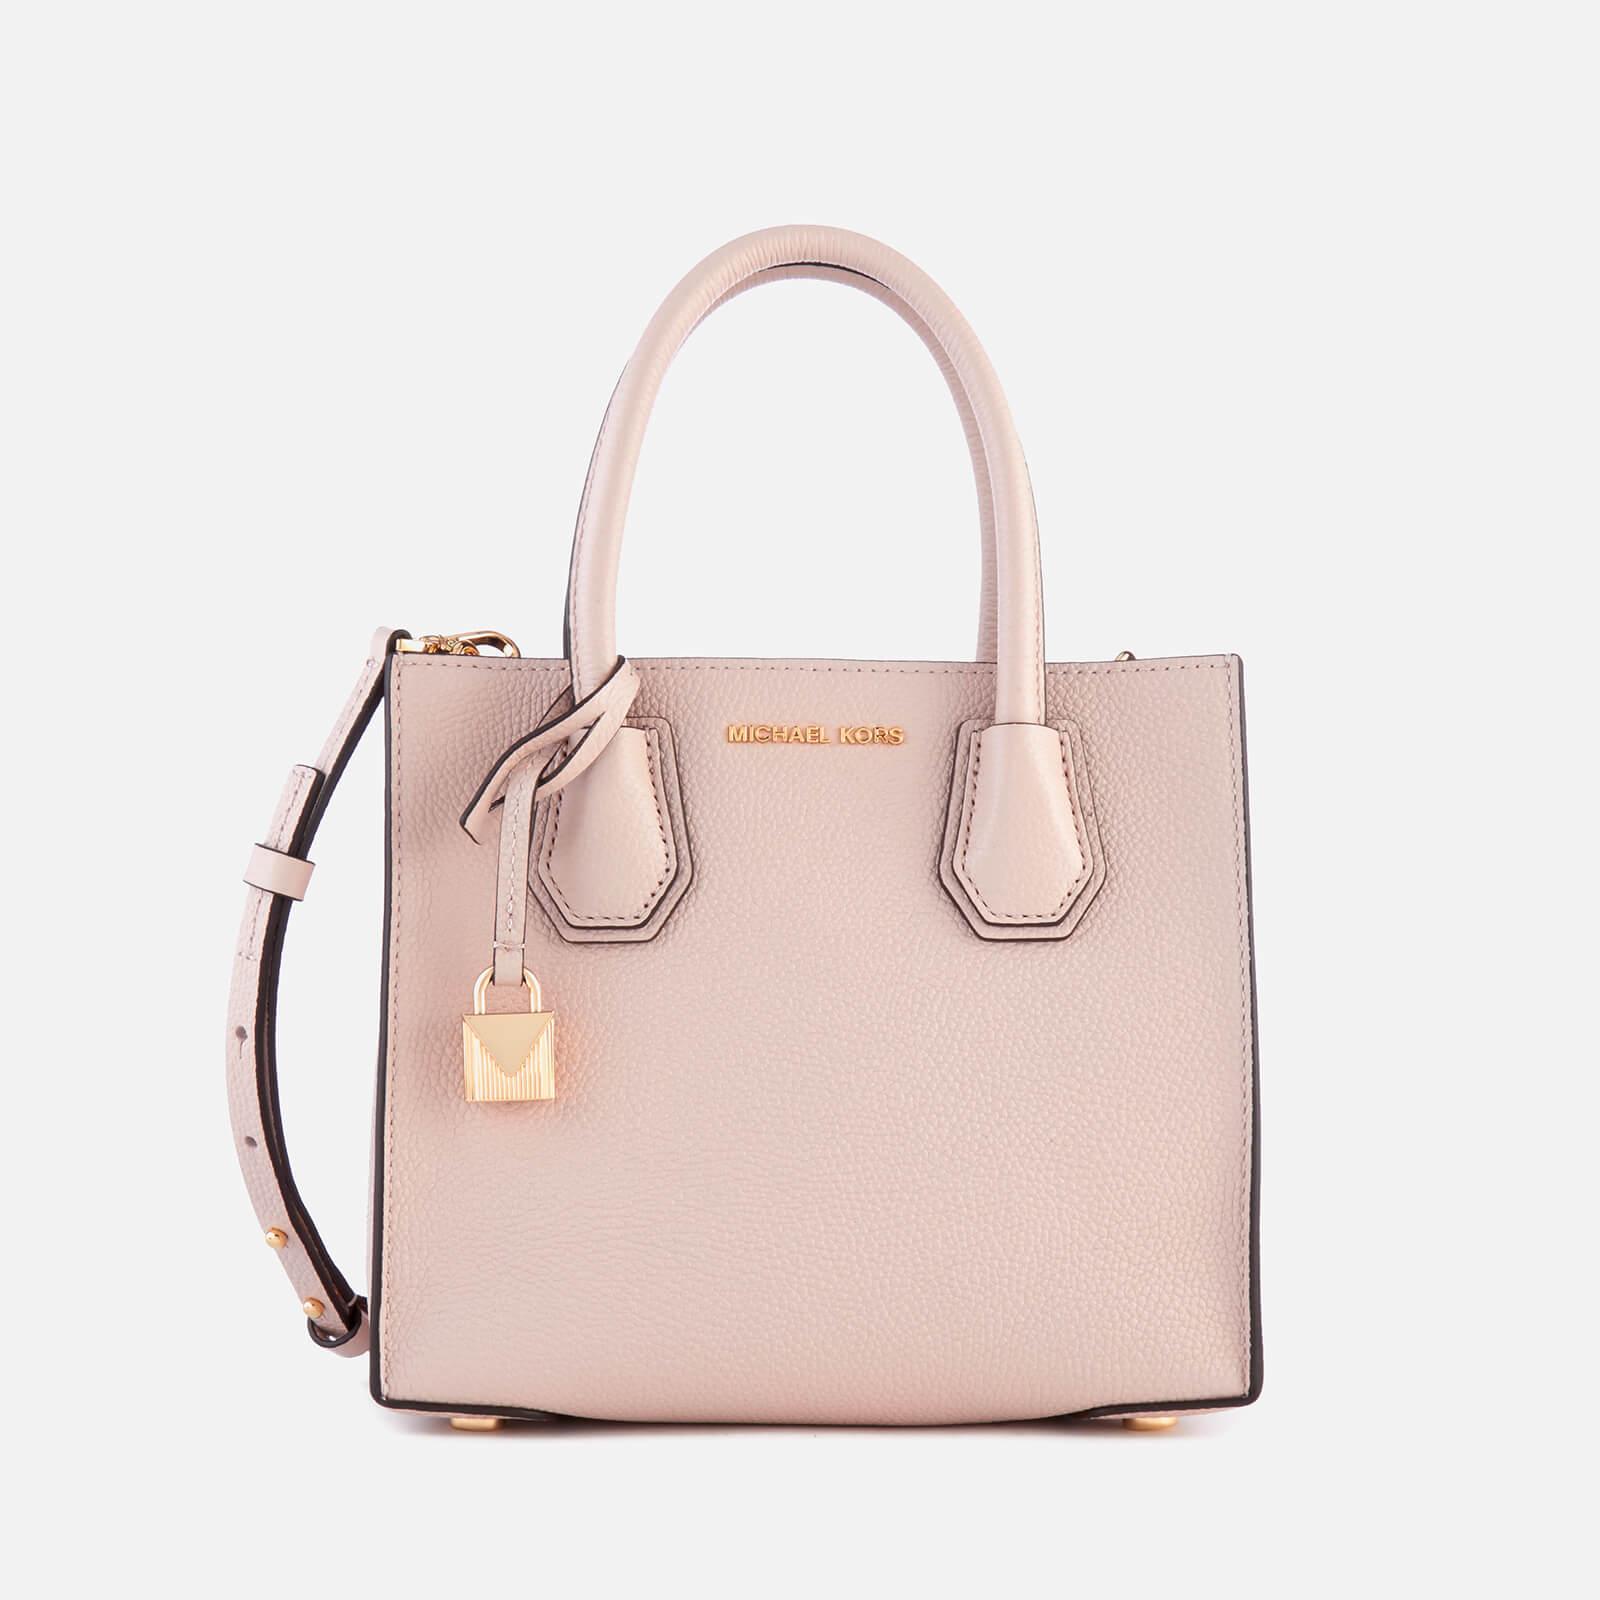 0f70f260be8b ... MICHAEL MICHAEL KORS Women's Mercer Medium Tote Bag - Soft Pink